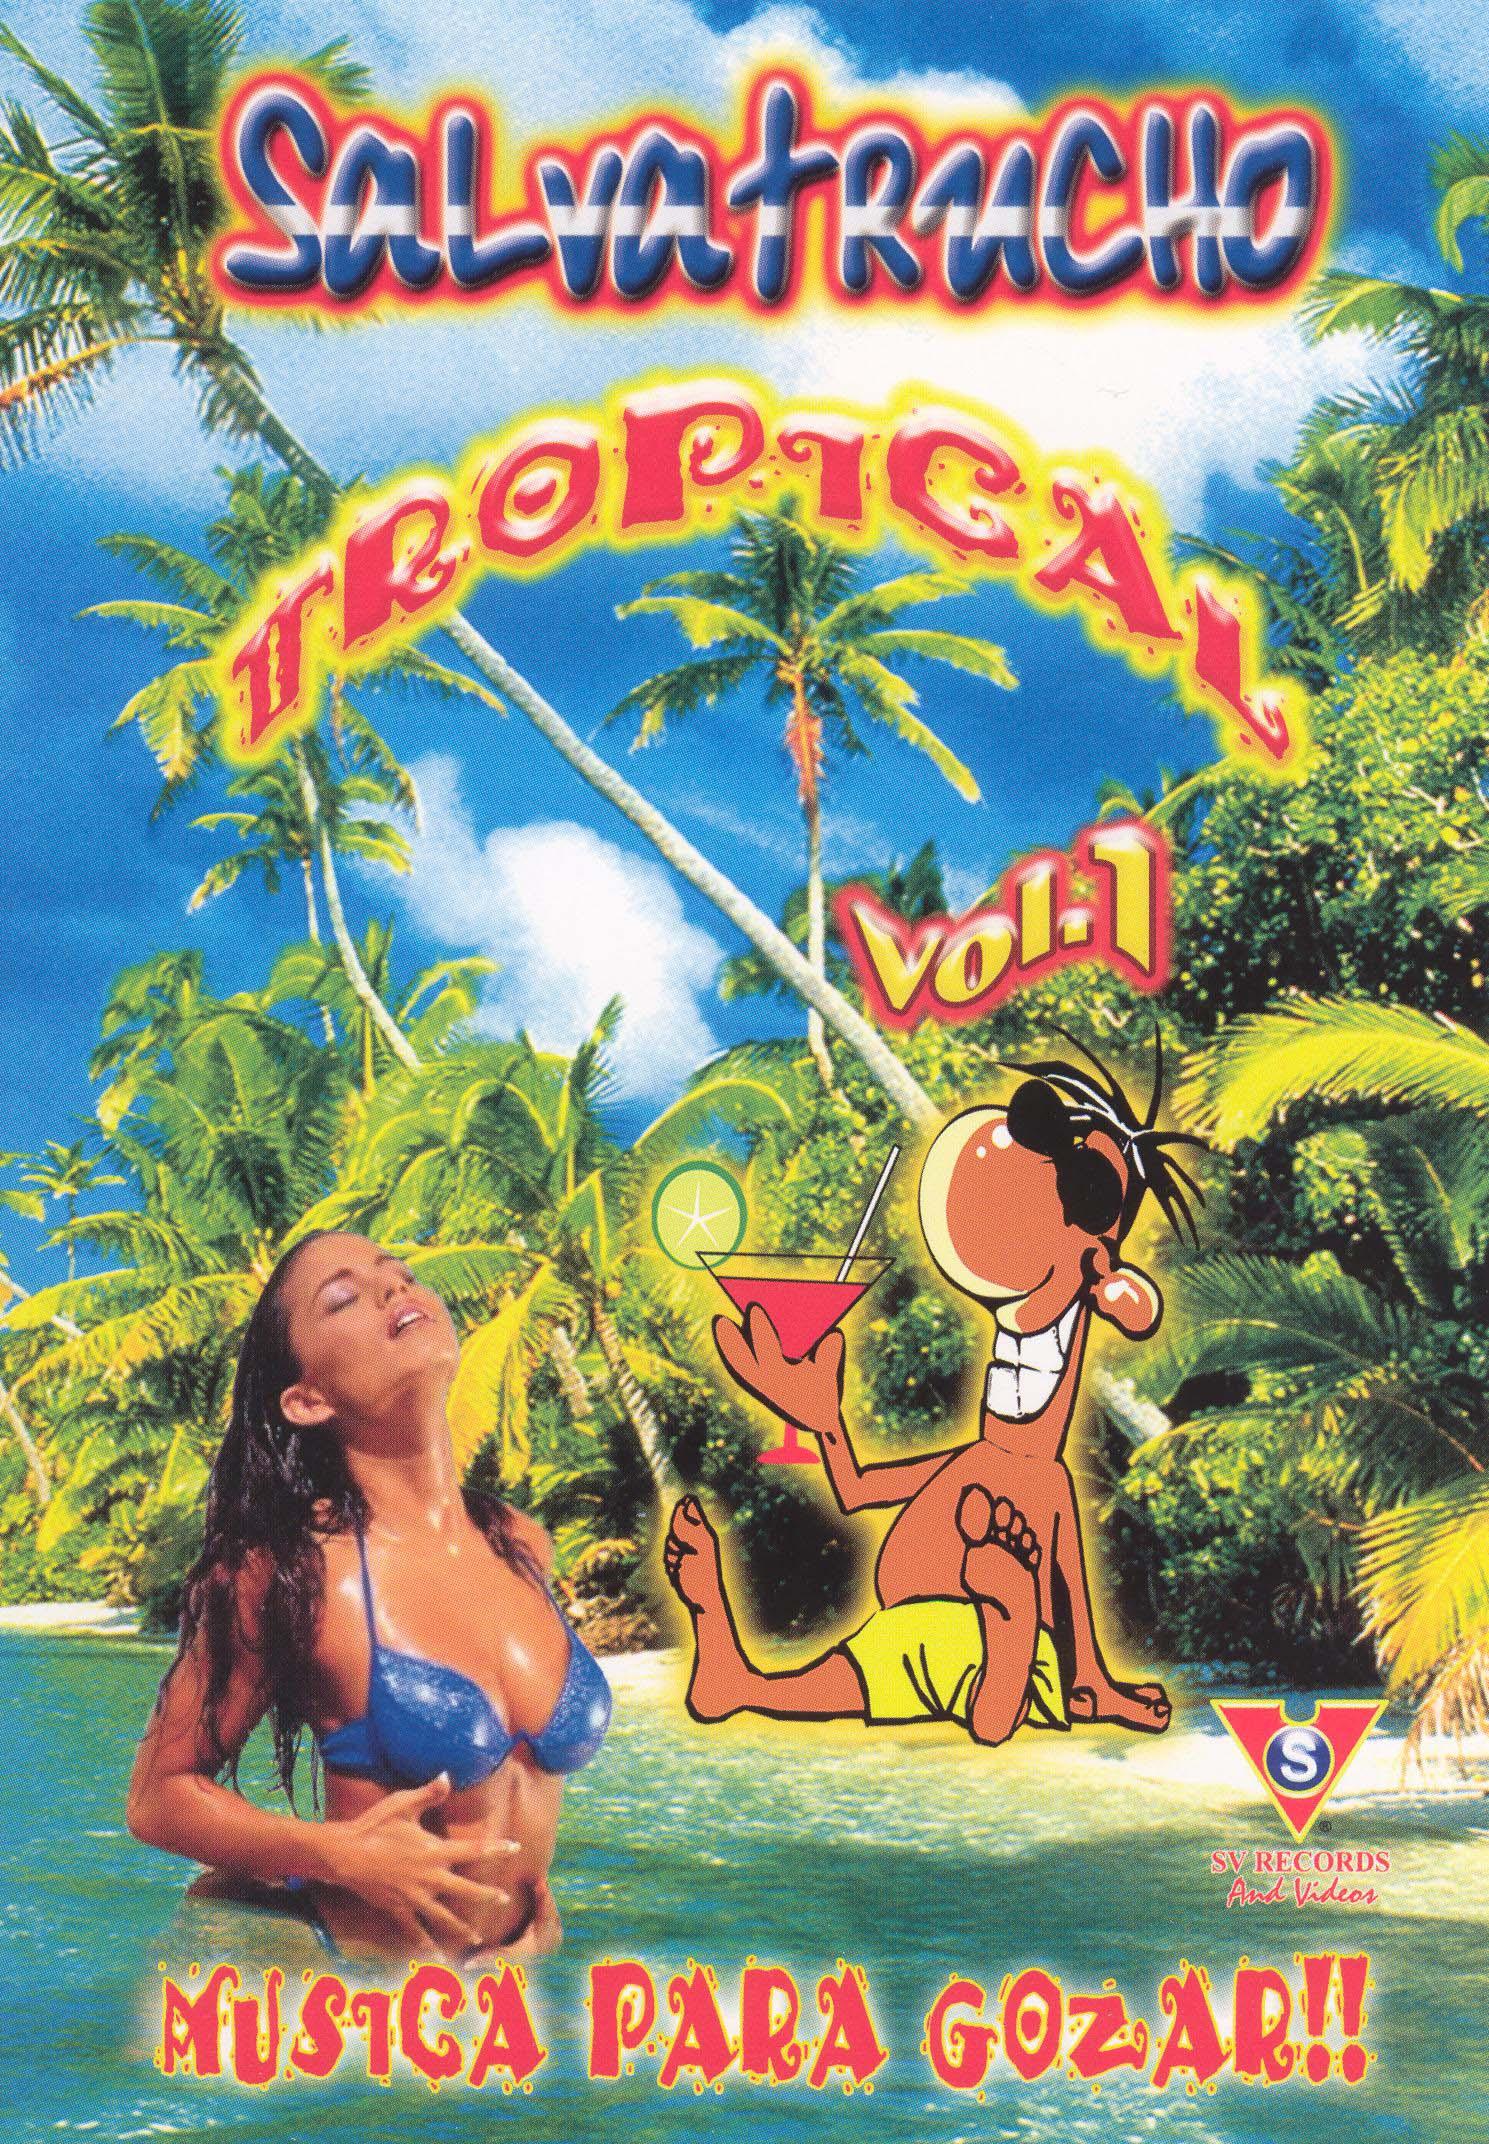 Salvatrucho: Tropical, Vol. 1 - Musica Para Gozar